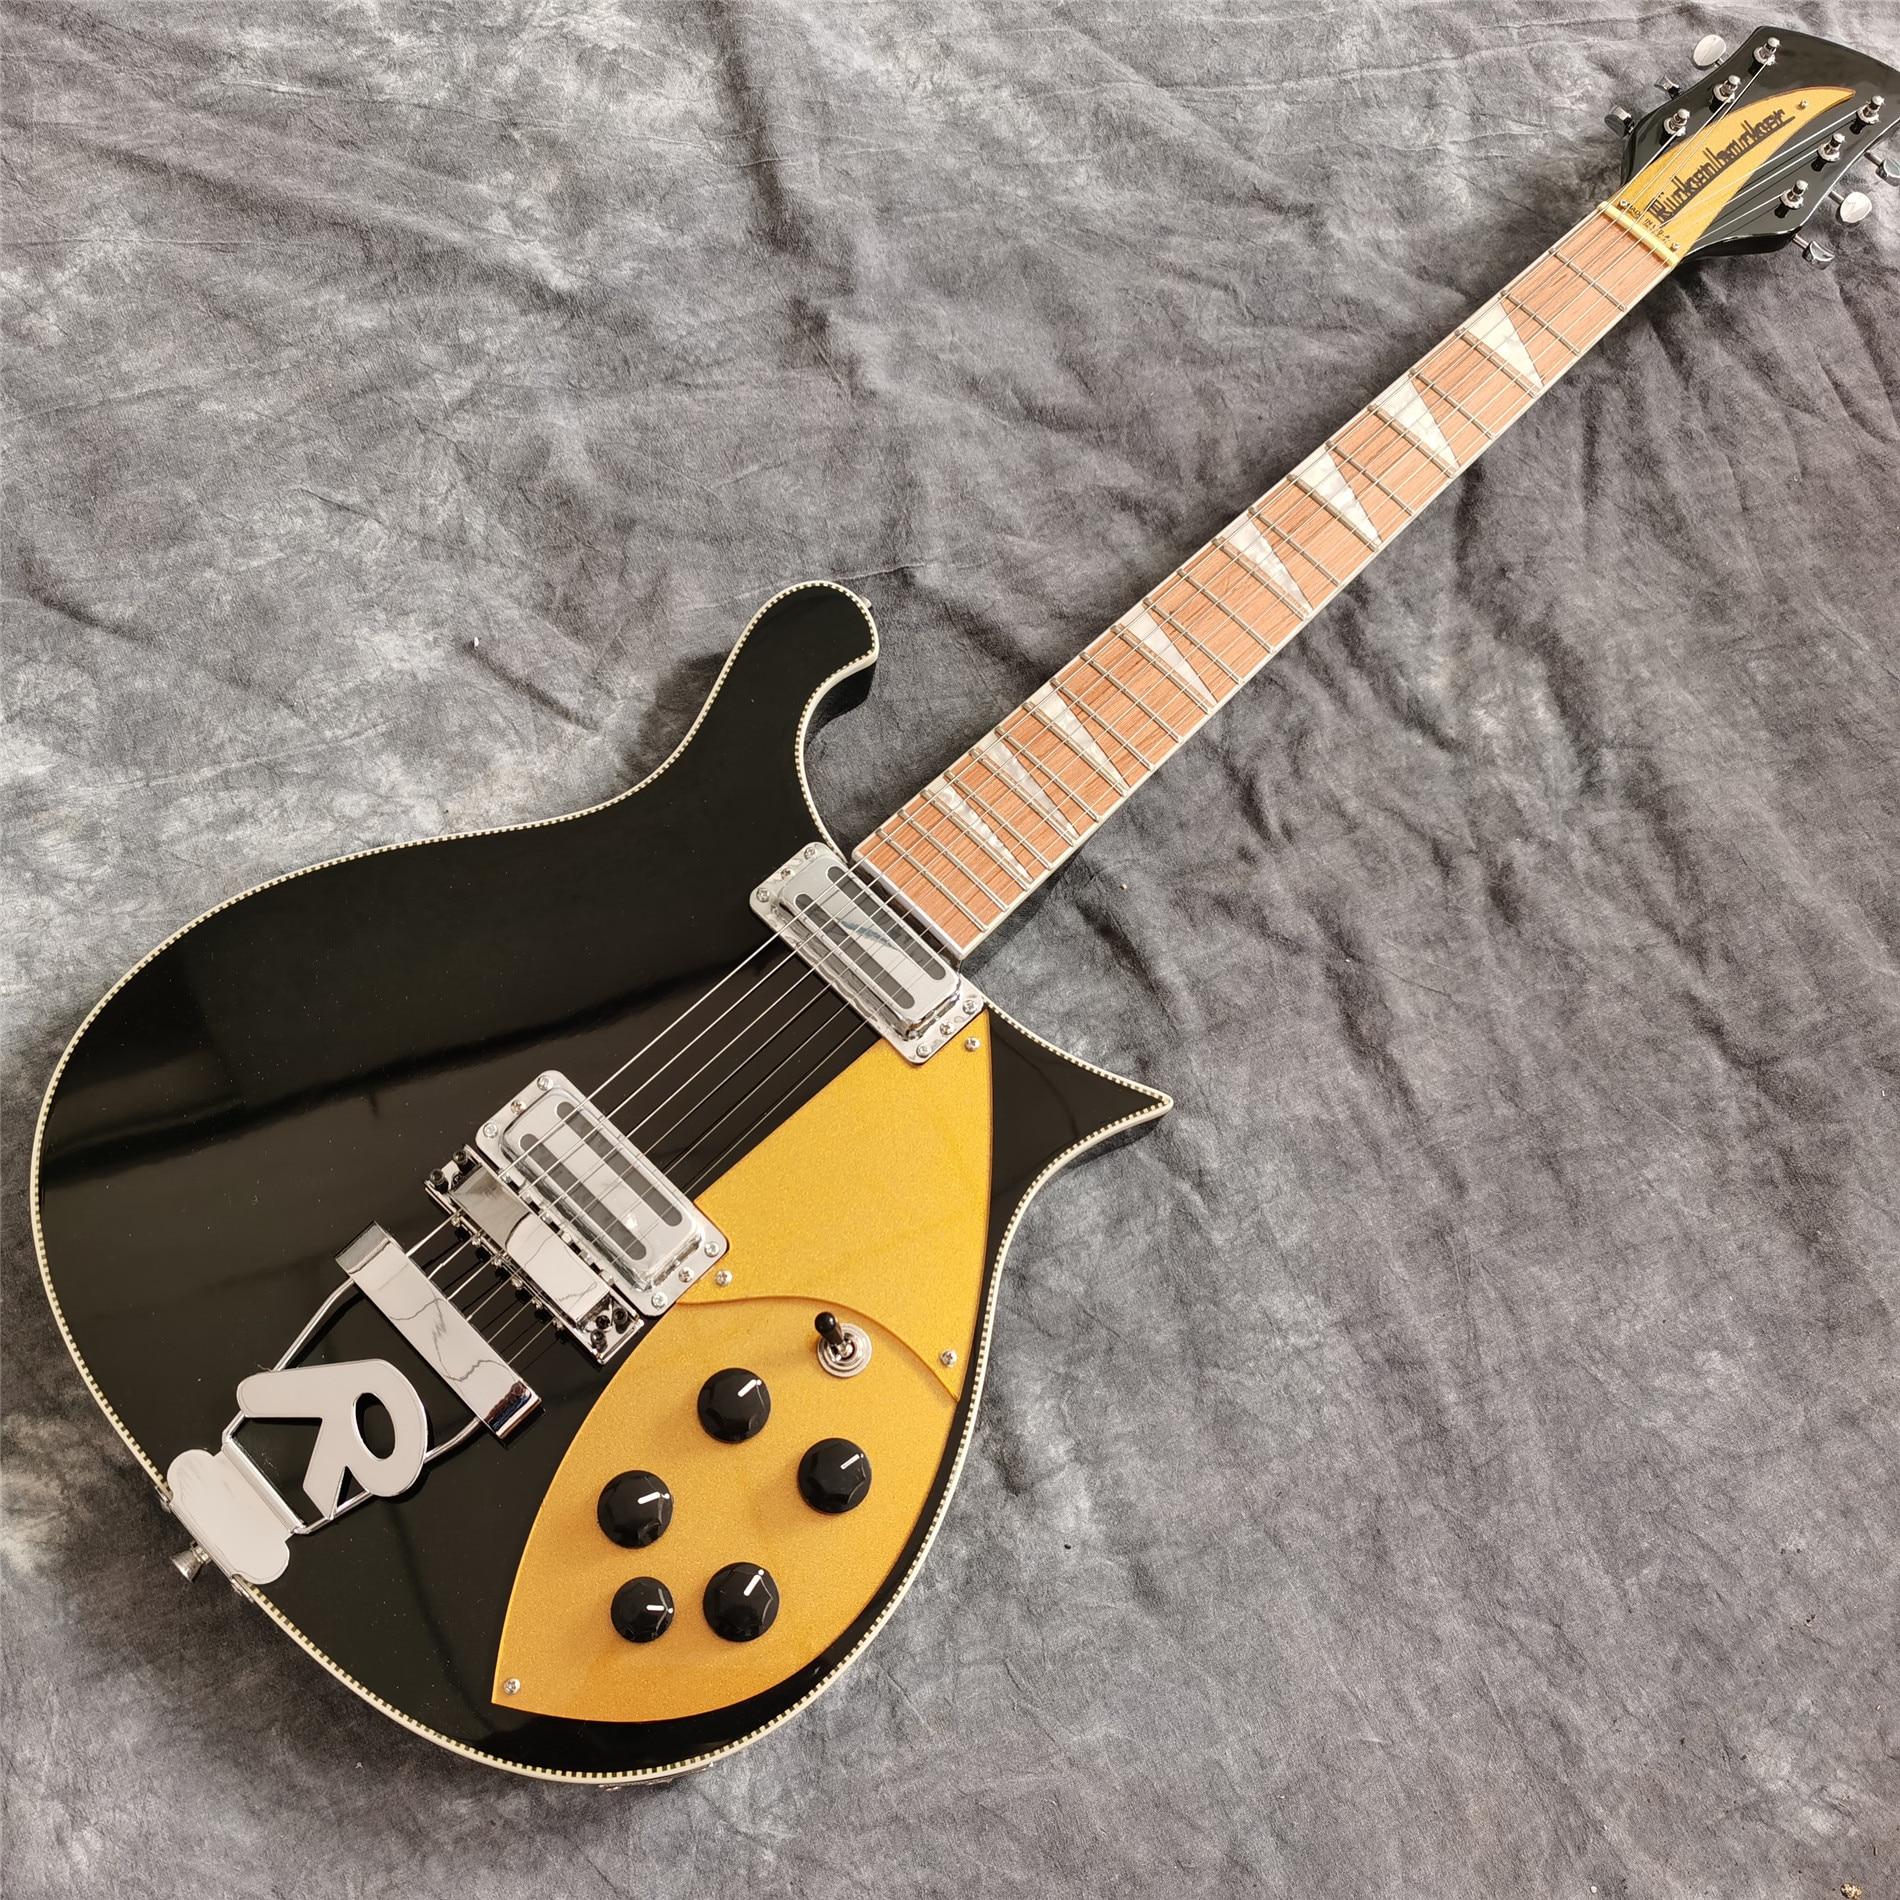 Black and chrome Acoustic Guitar Pickguard